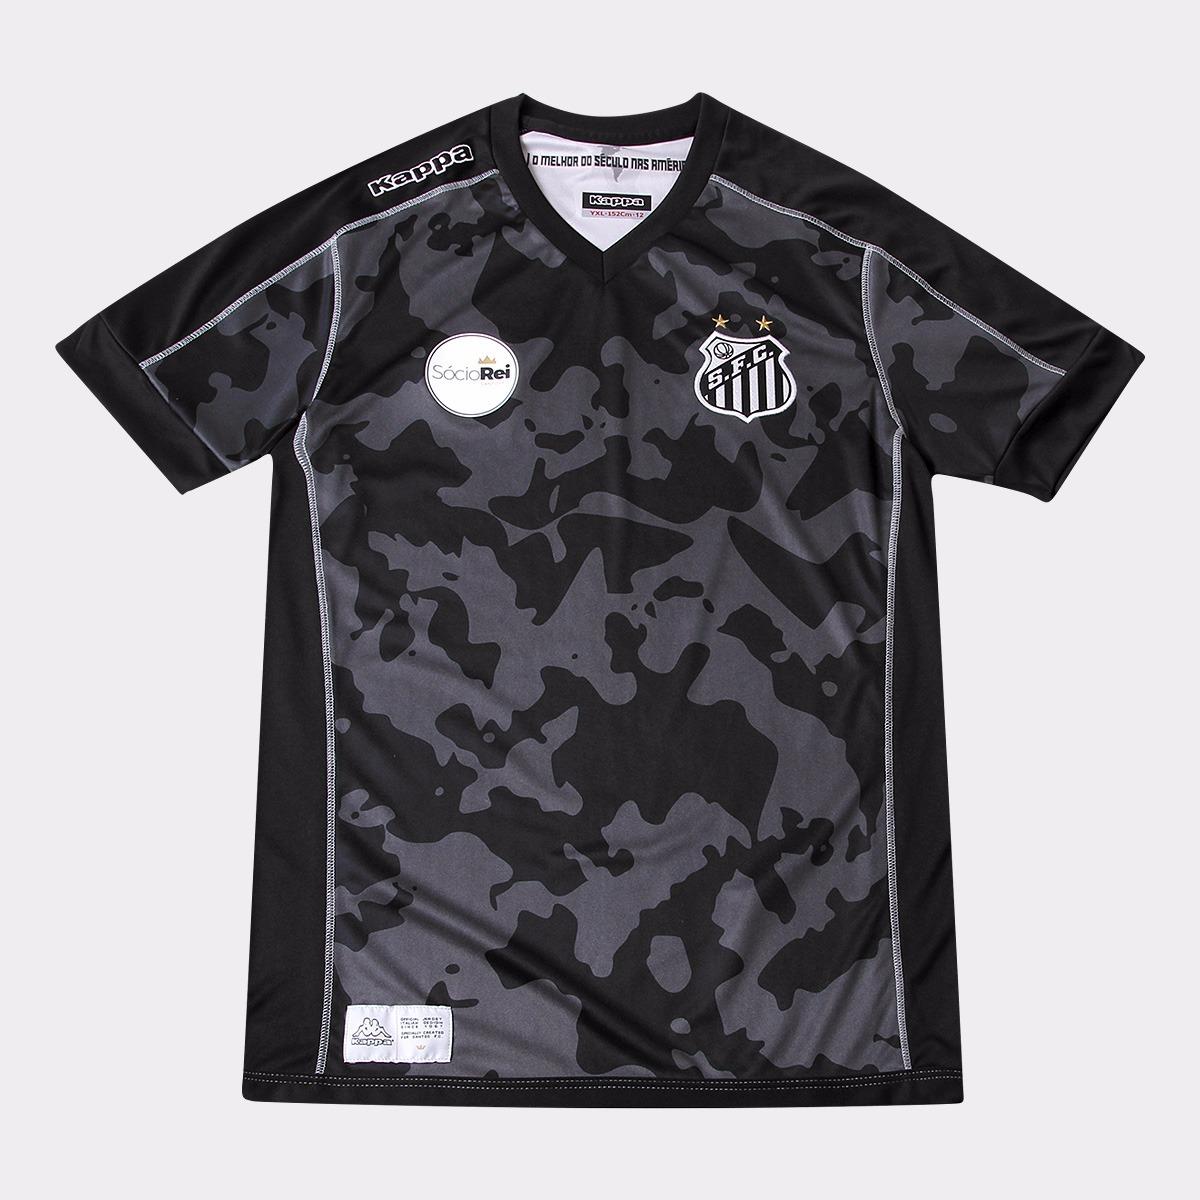 camisa santos kappa juvenil oficial uniforme ill 2017 2018. Carregando zoom. 1036921824b86